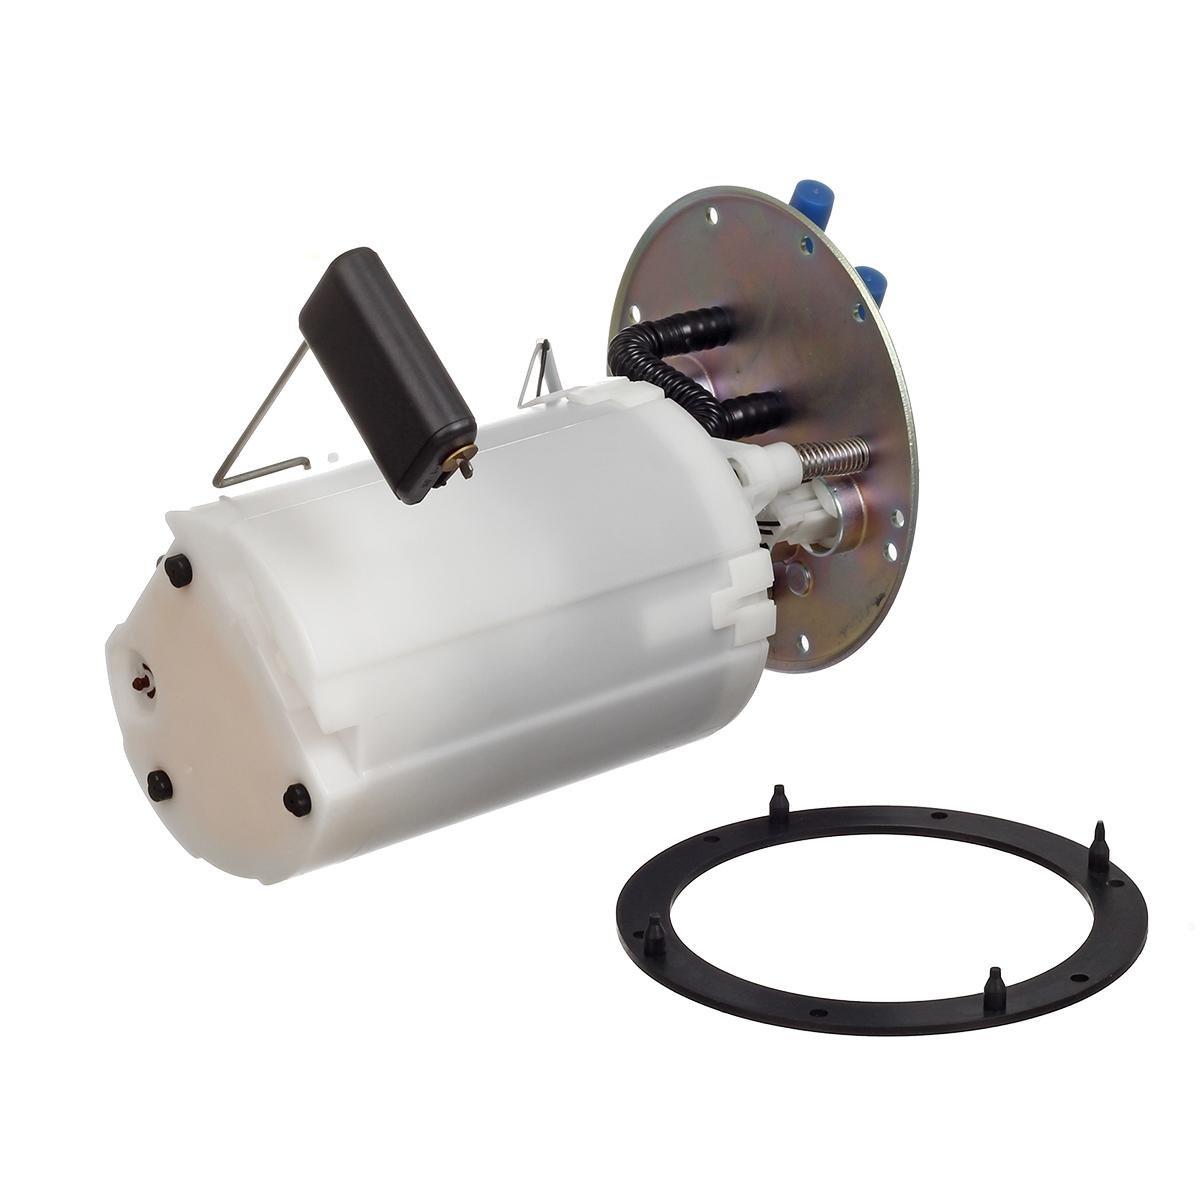 Powerco Fuel Pump Module Assembly For 2005 2004 Kia 2007 Sedona Filter Except California 2003 2002 With Sending Unit E8482m Automotive